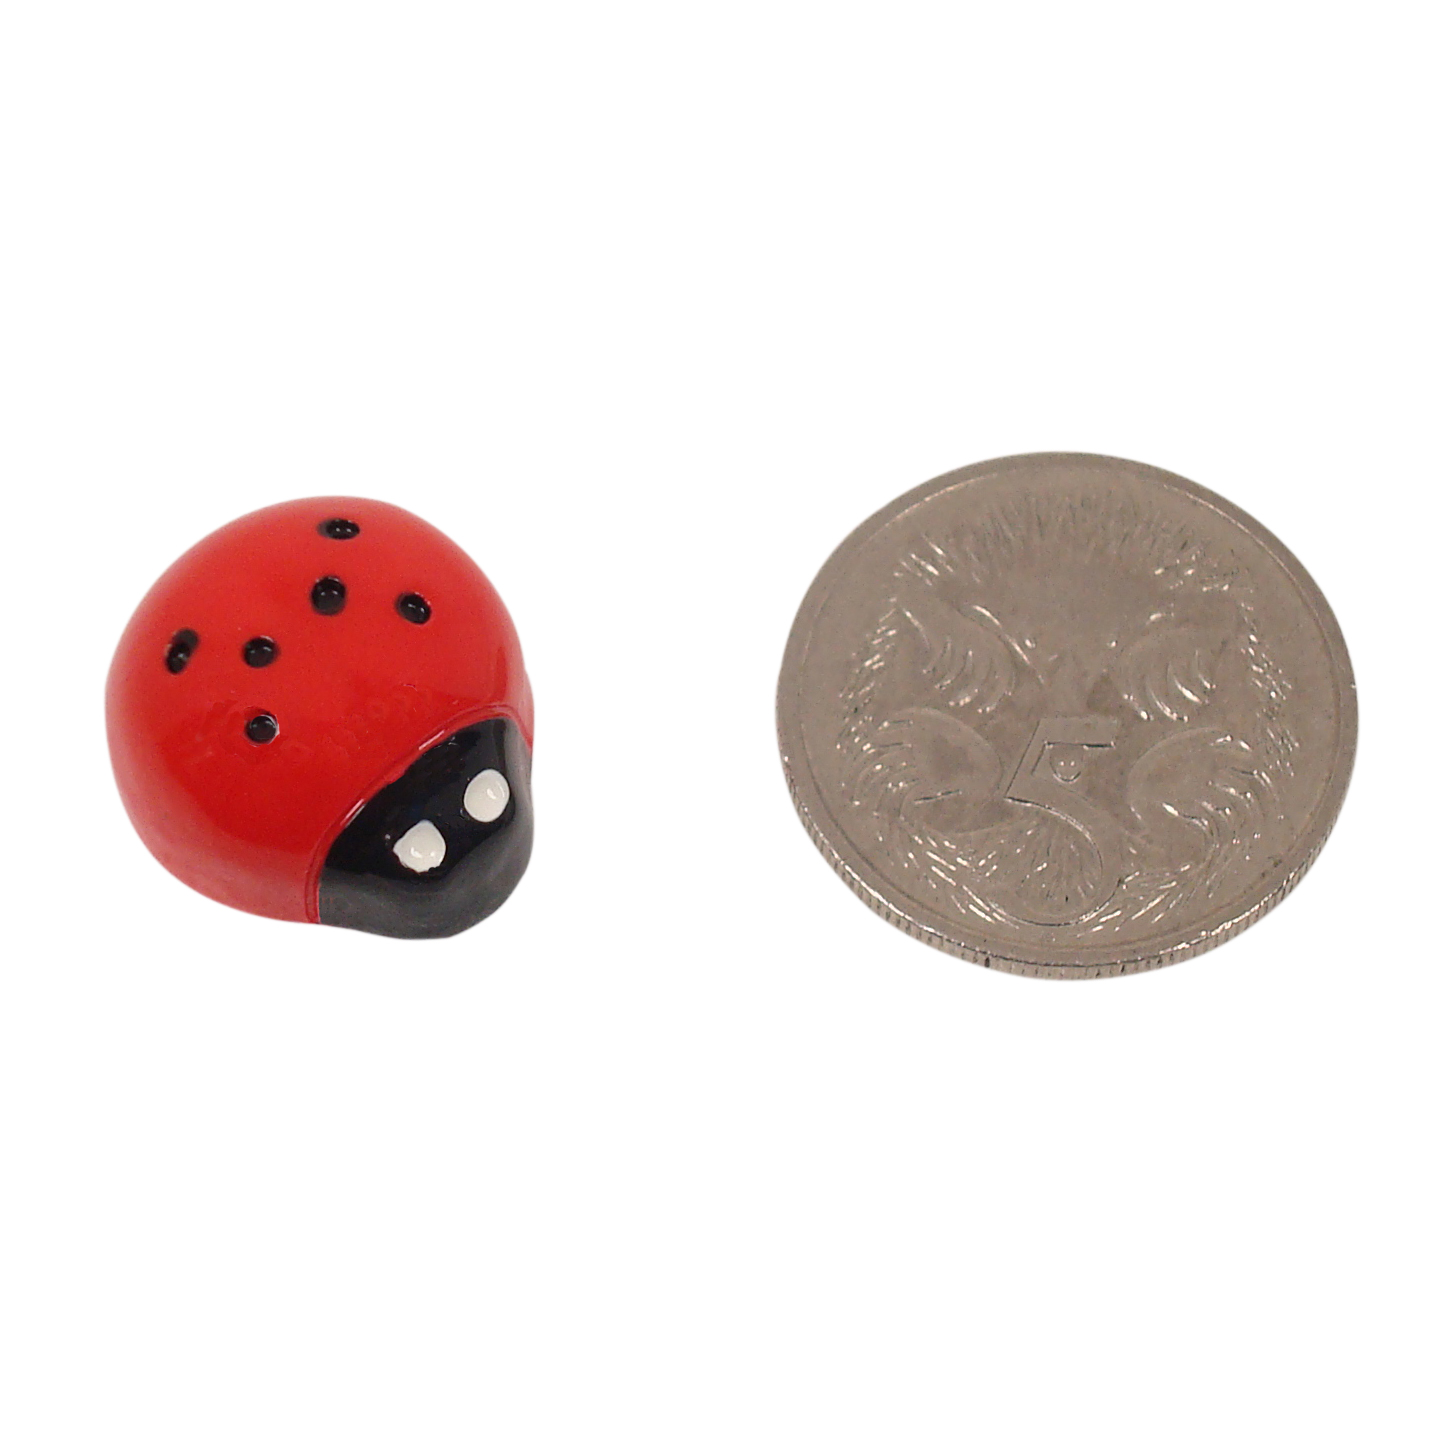 Mini Ladybug - 1.5cm